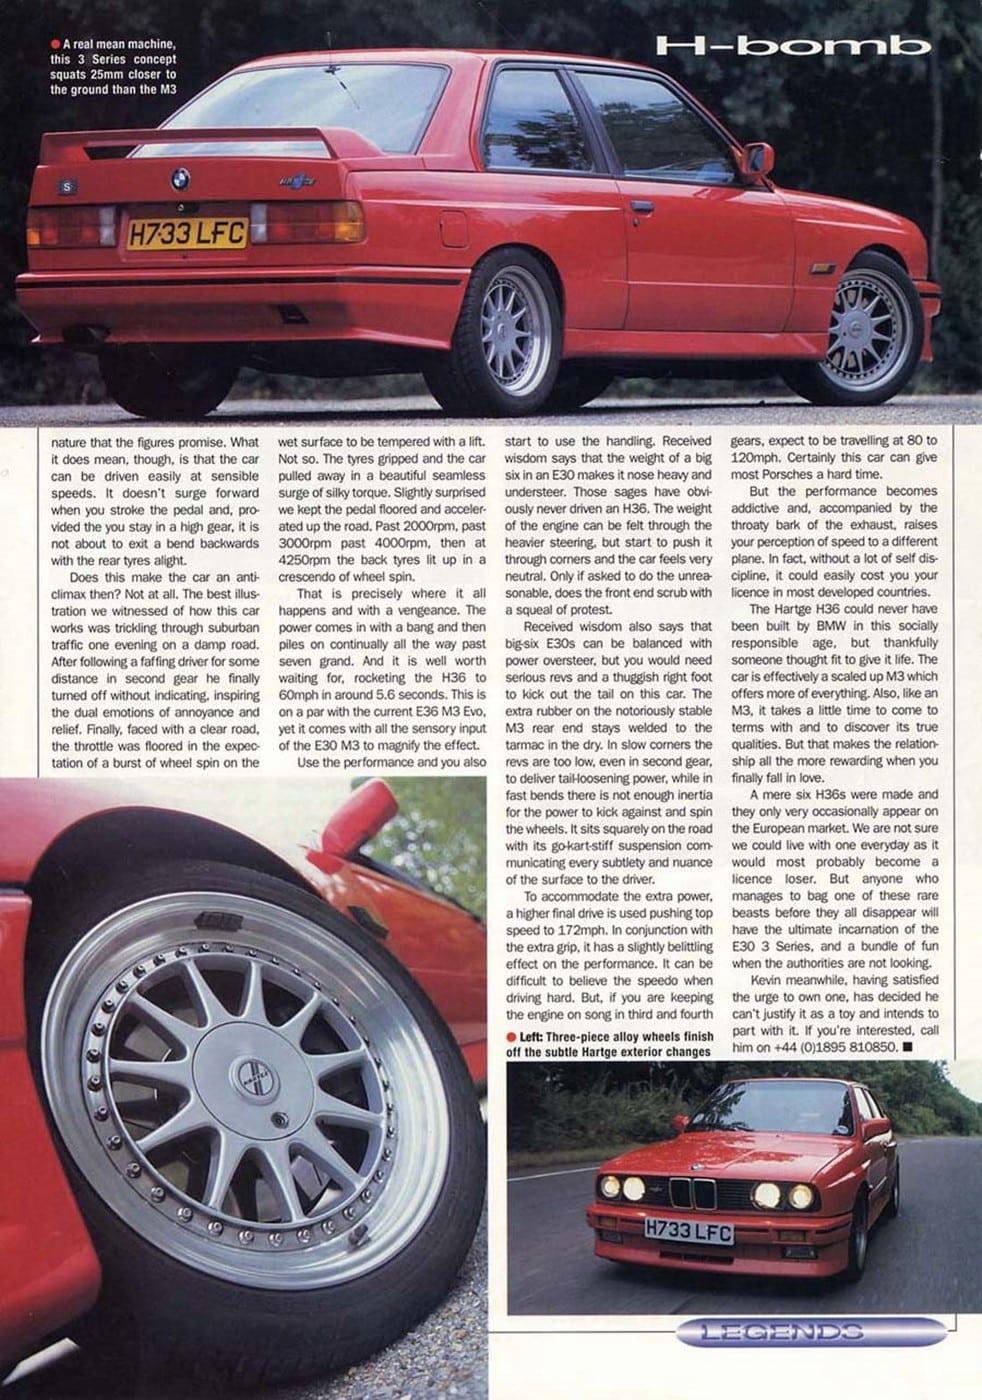 Harthe H36 BMW Car Magazine 1997